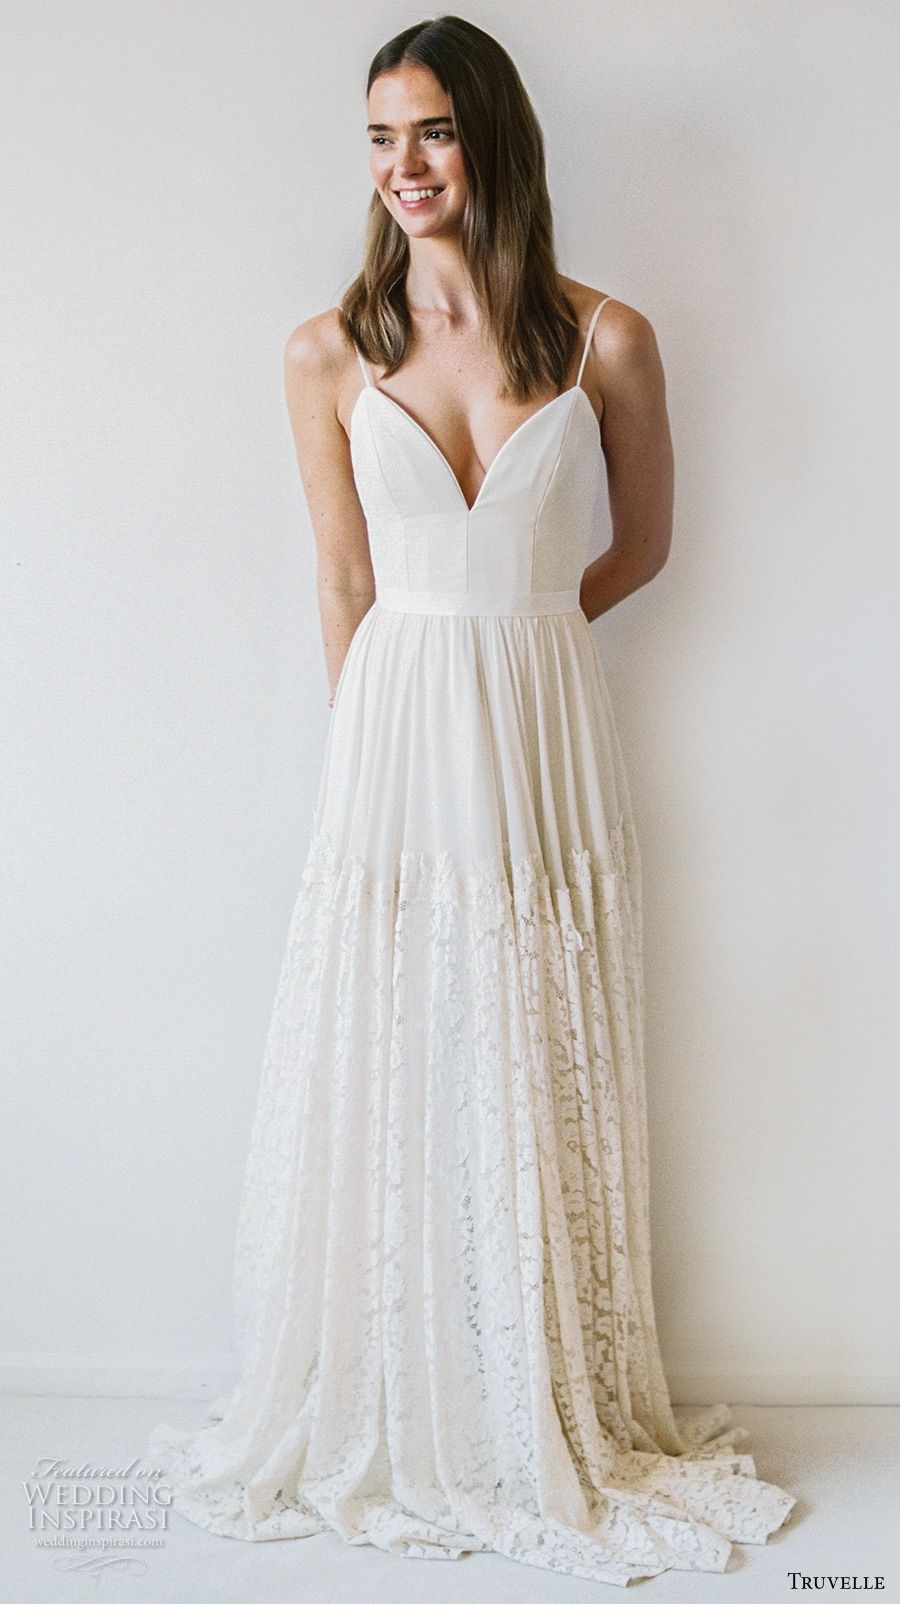 Truvelle 2017 Wedding Dresses | Bodice, Neckline and Romantic